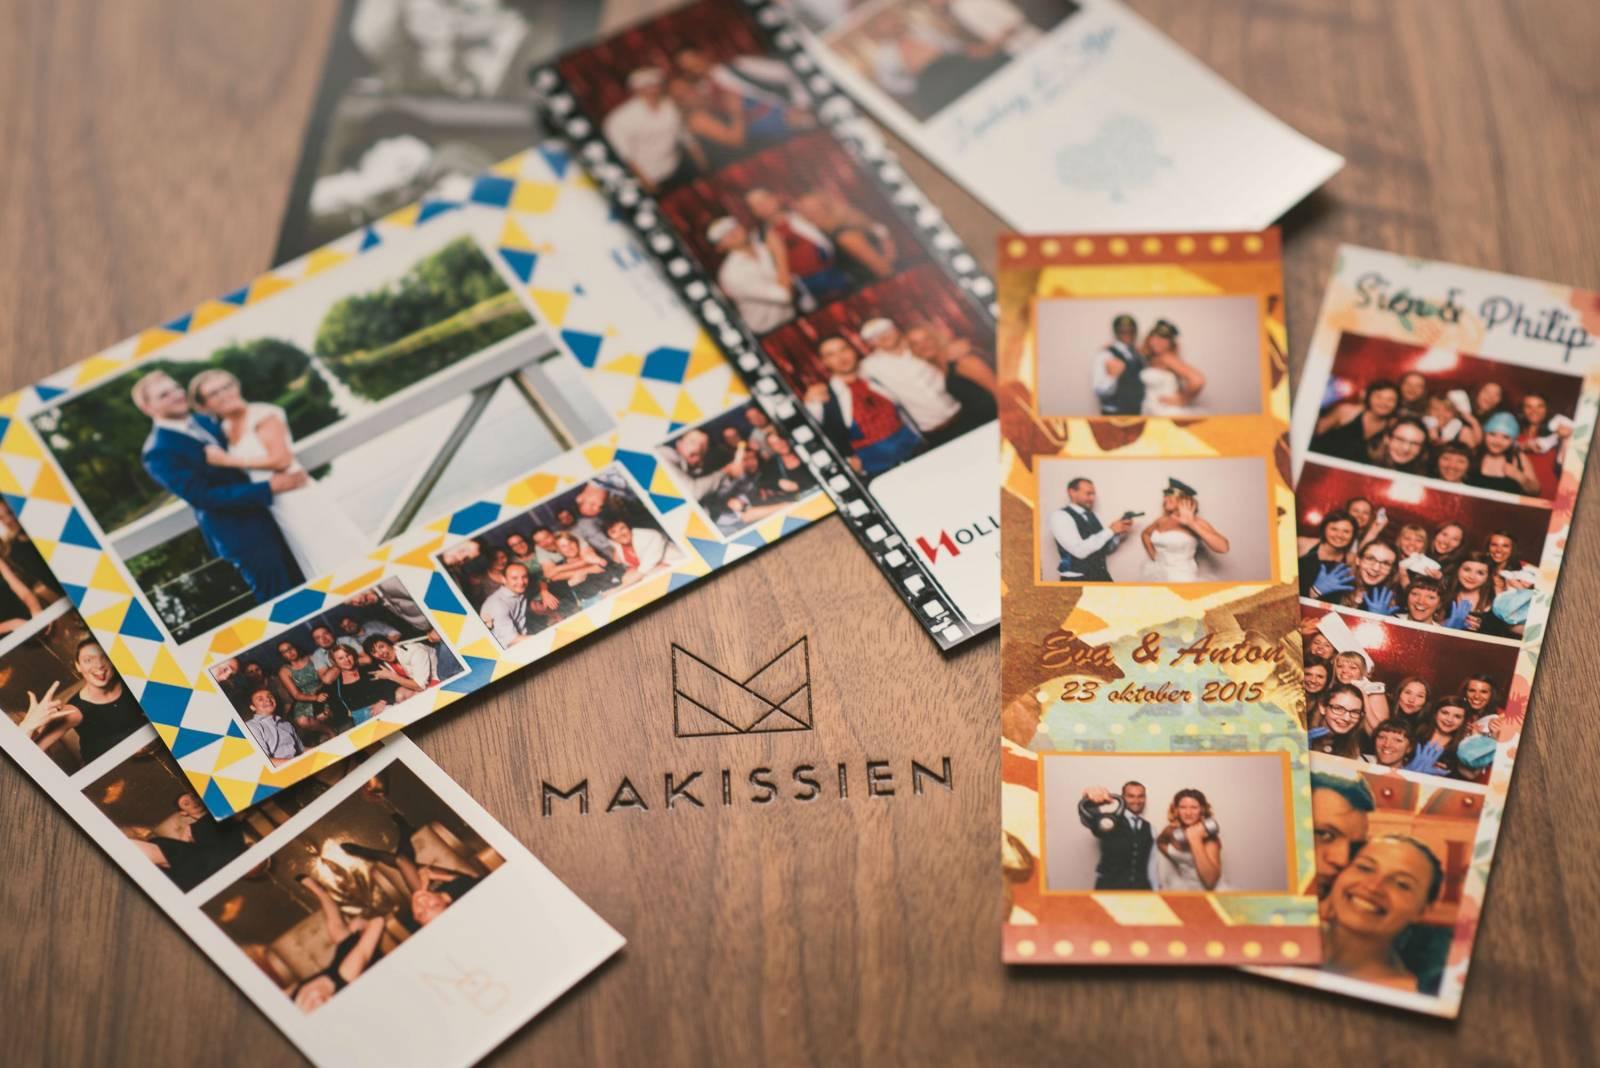 Makissien - Photobooth - House of Weddings - 31